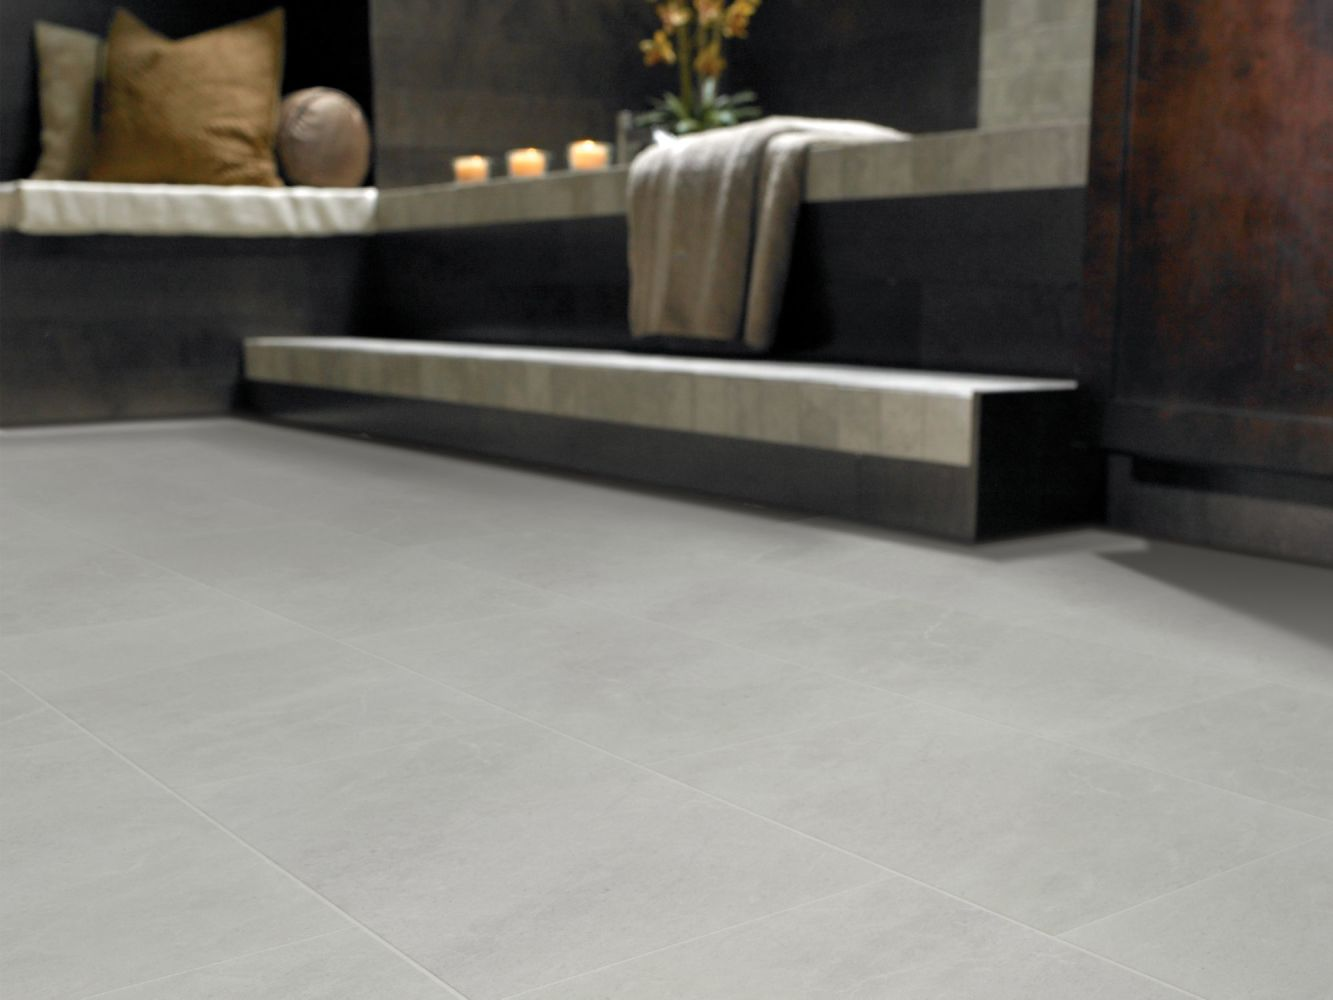 Shaw Floors Home Fn Gold Ceramic Serenity 17 Bone 00100_TGJ89